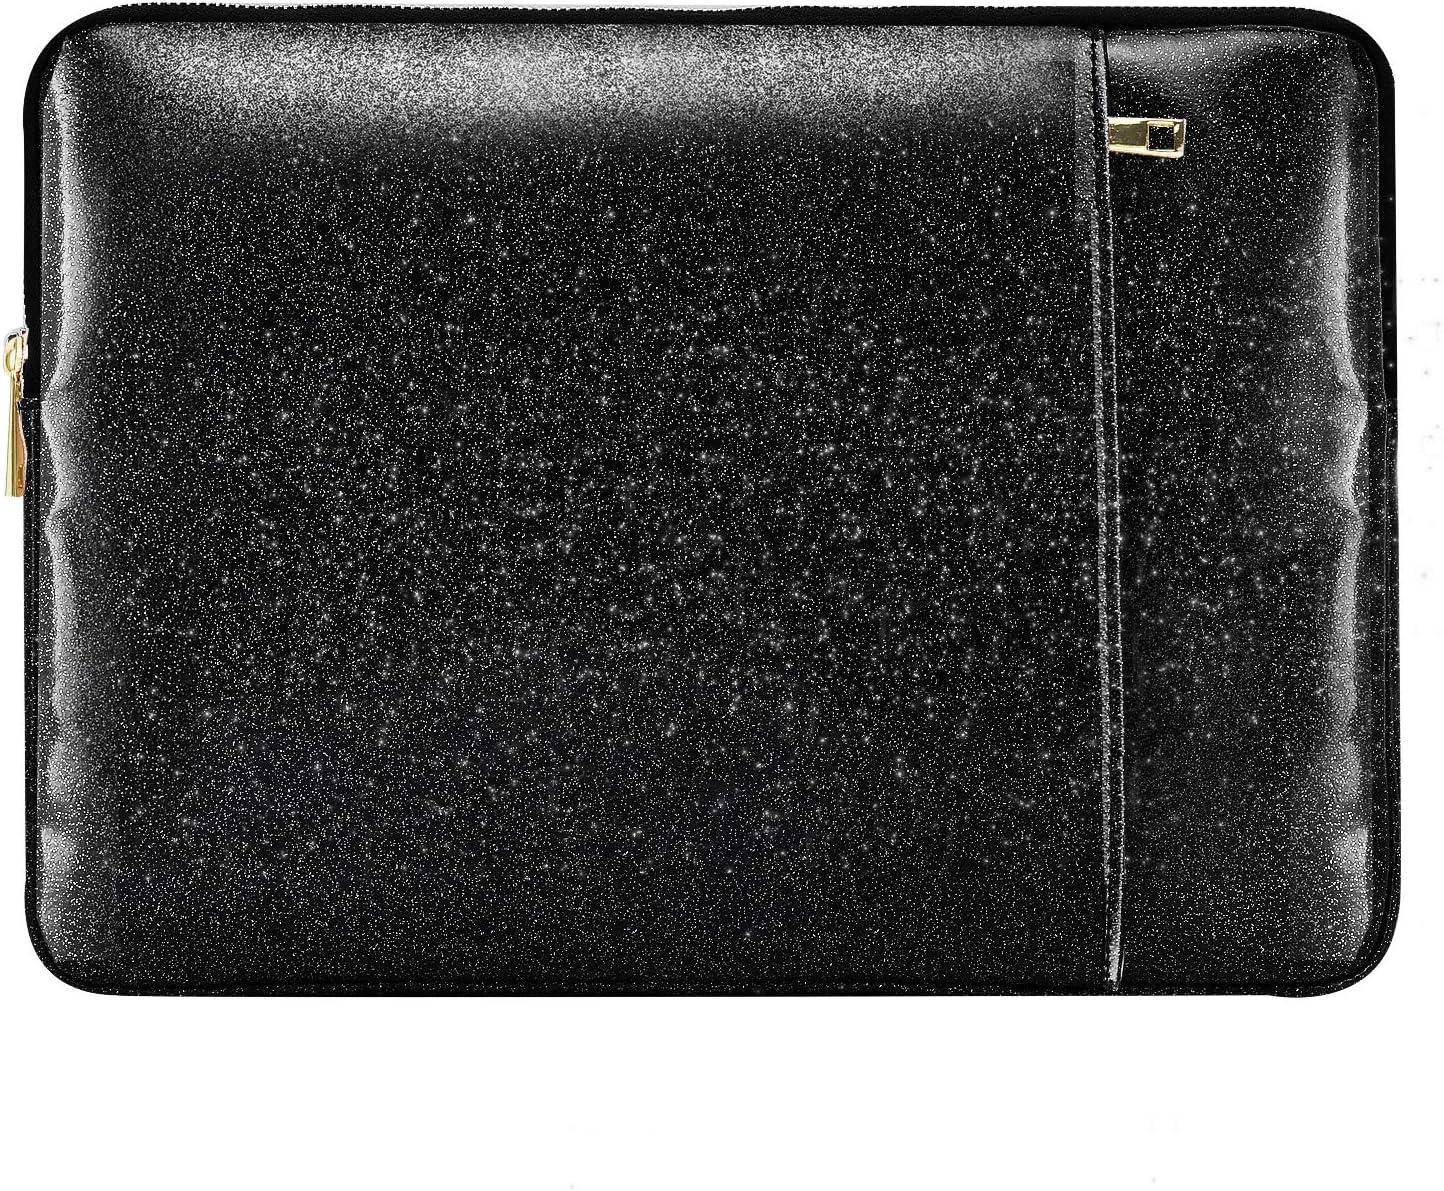 "MoKo 13 Inch Laptop Sleeve Case Bag Fits MacBook Air 13 / MacBook Pro Retina 13 / iPad Pro 12.9 / Surface Pro X 13"", PU Leather Portable Universal Notebook Case Waterproof Bag - Shining Black"